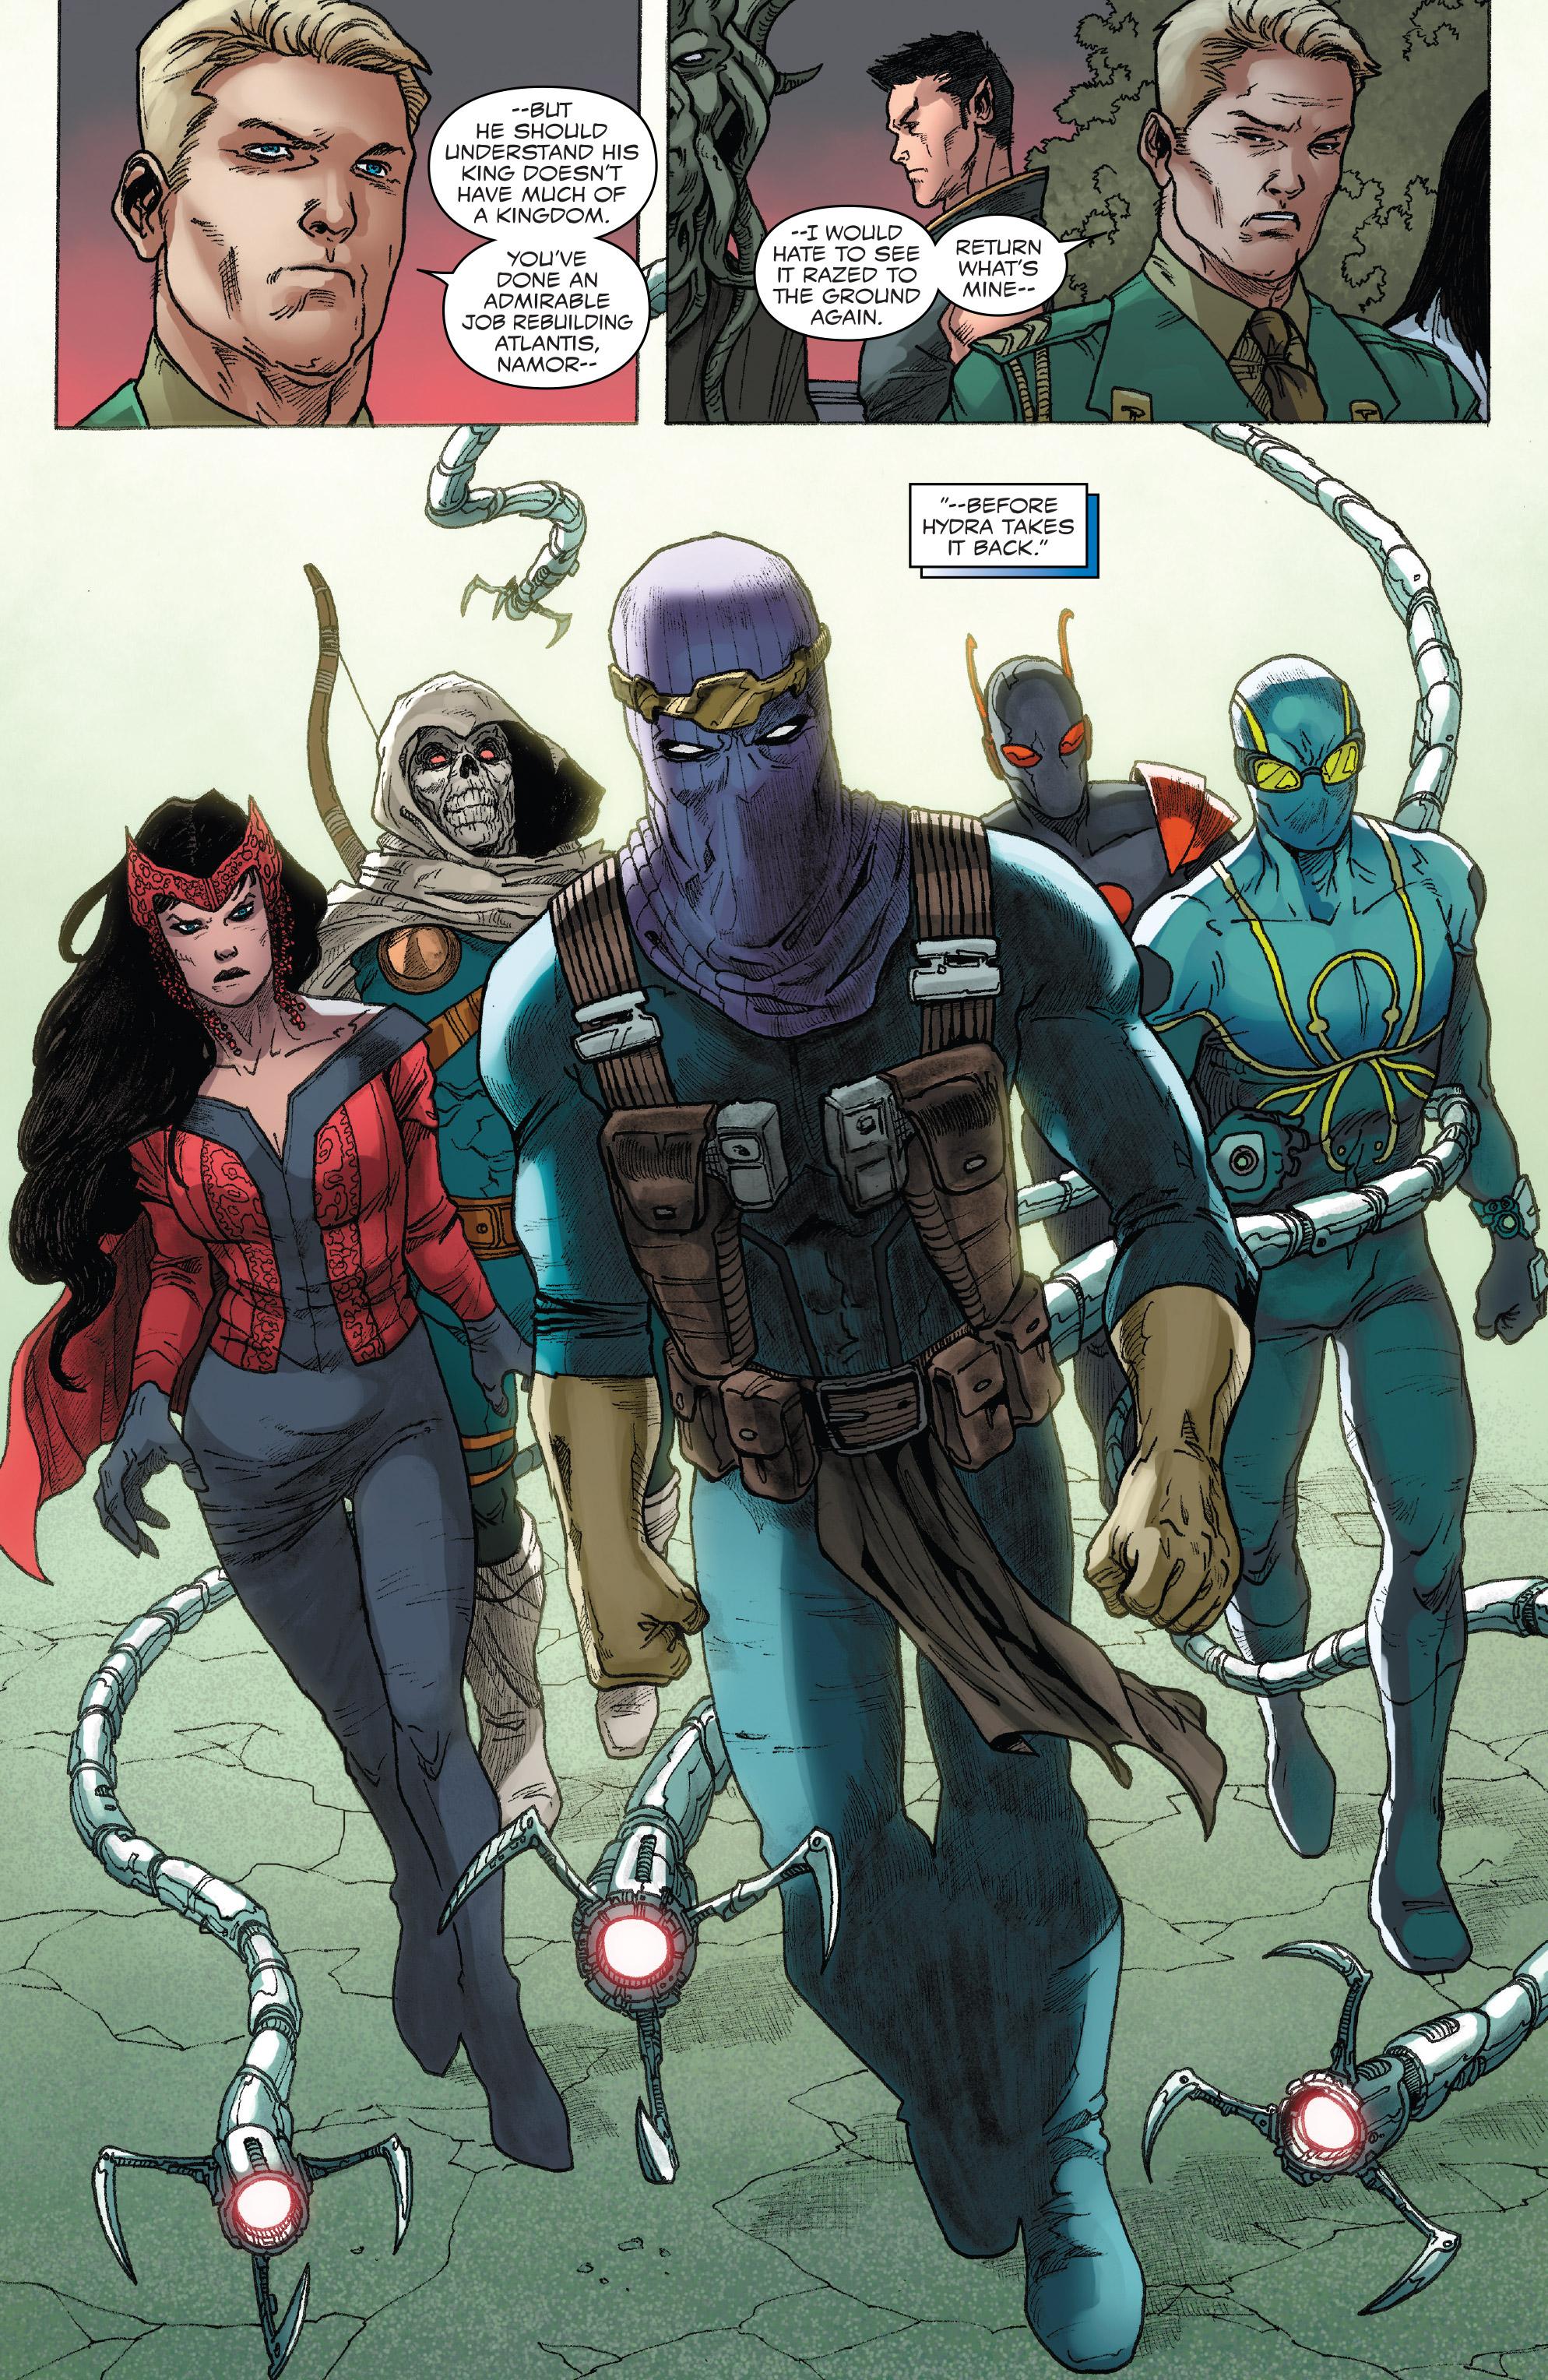 Read online Captain America: Steve Rogers comic -  Issue #18 - 22